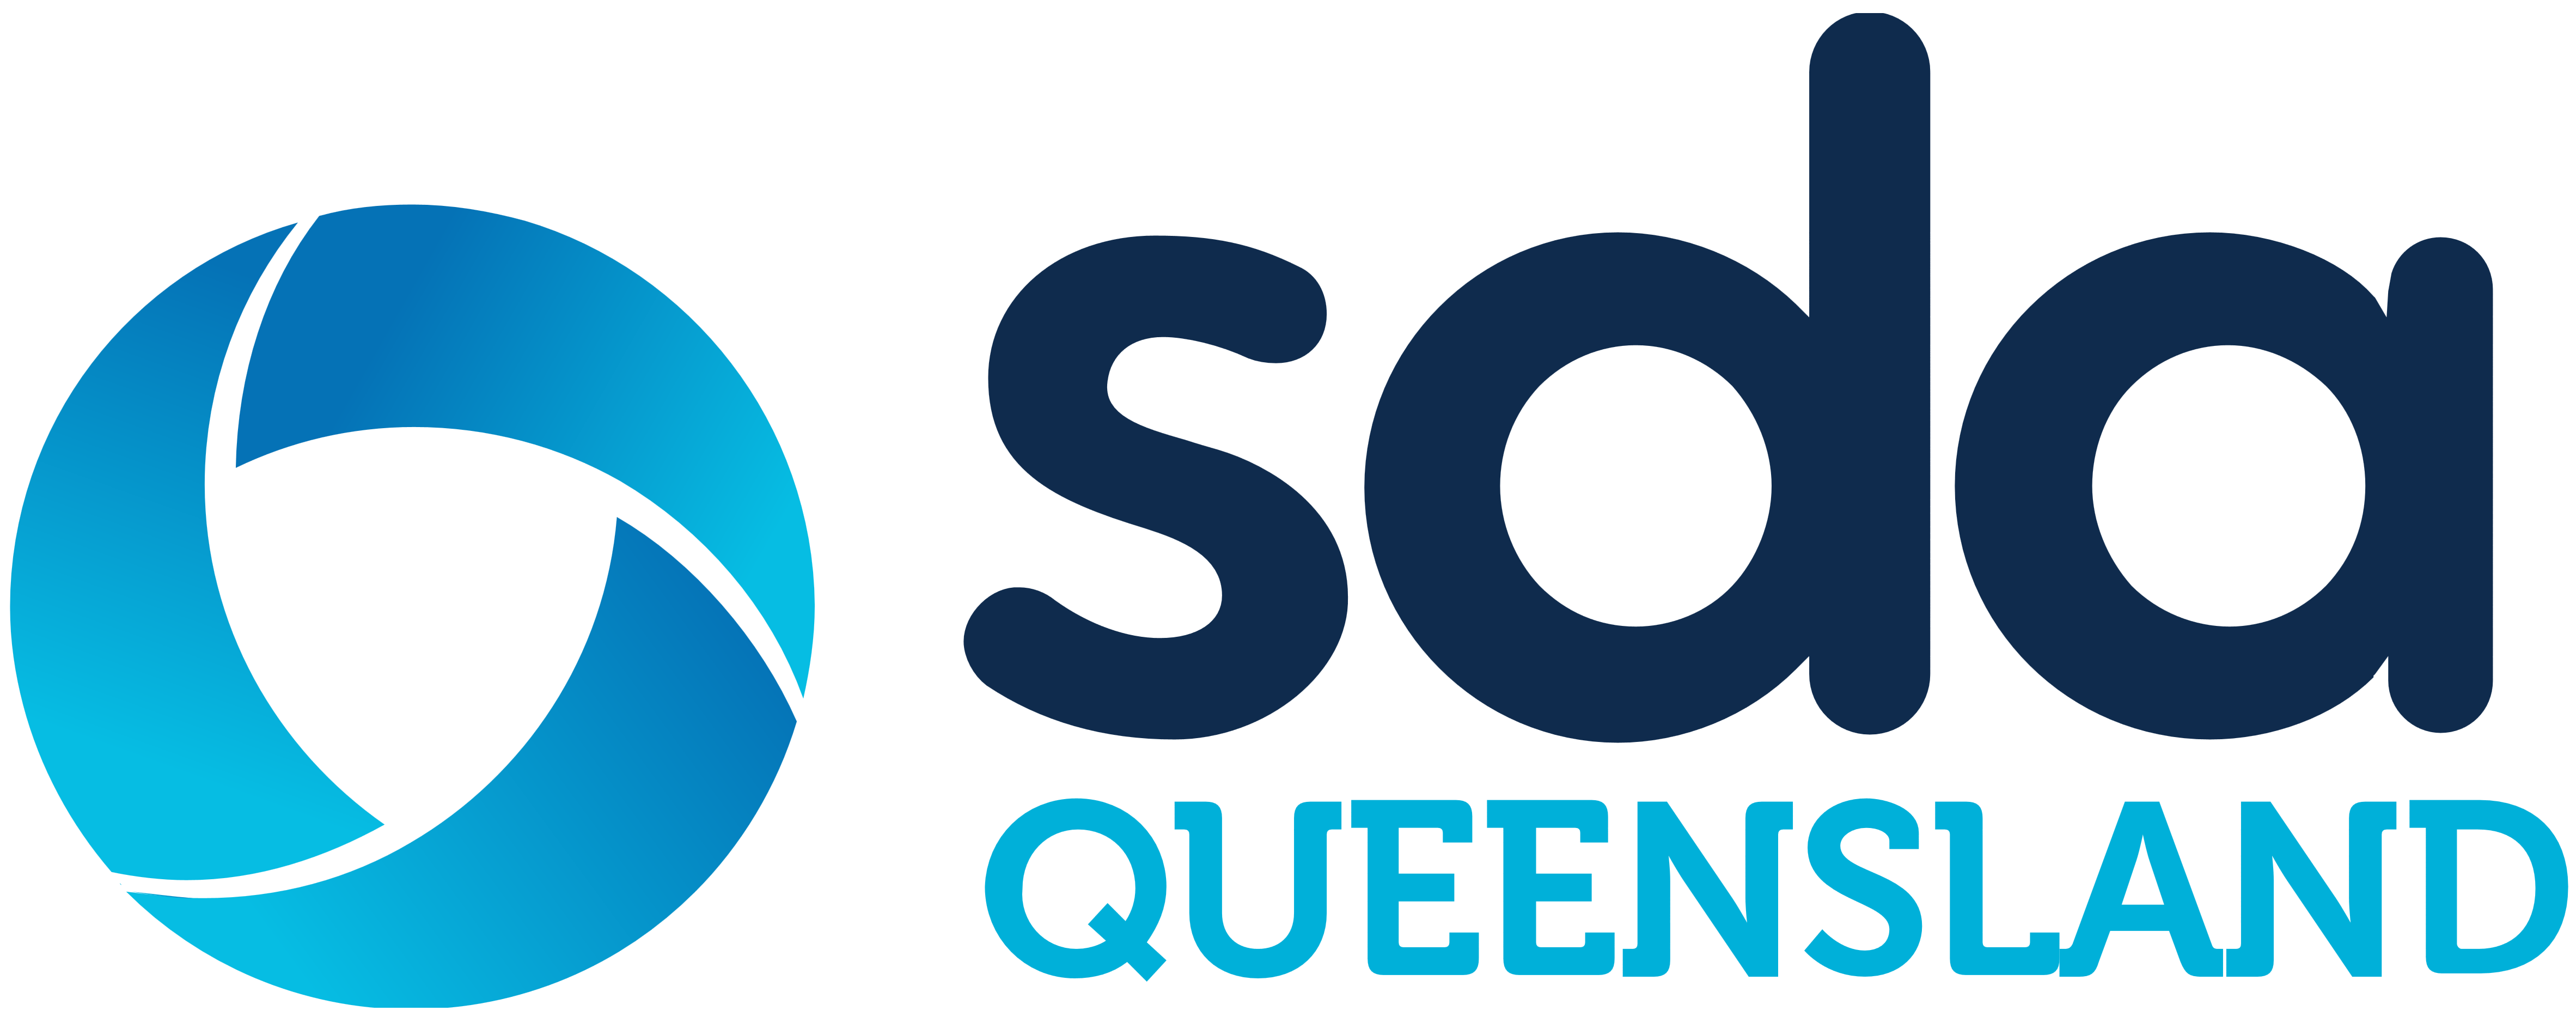 sda queensland � logos download